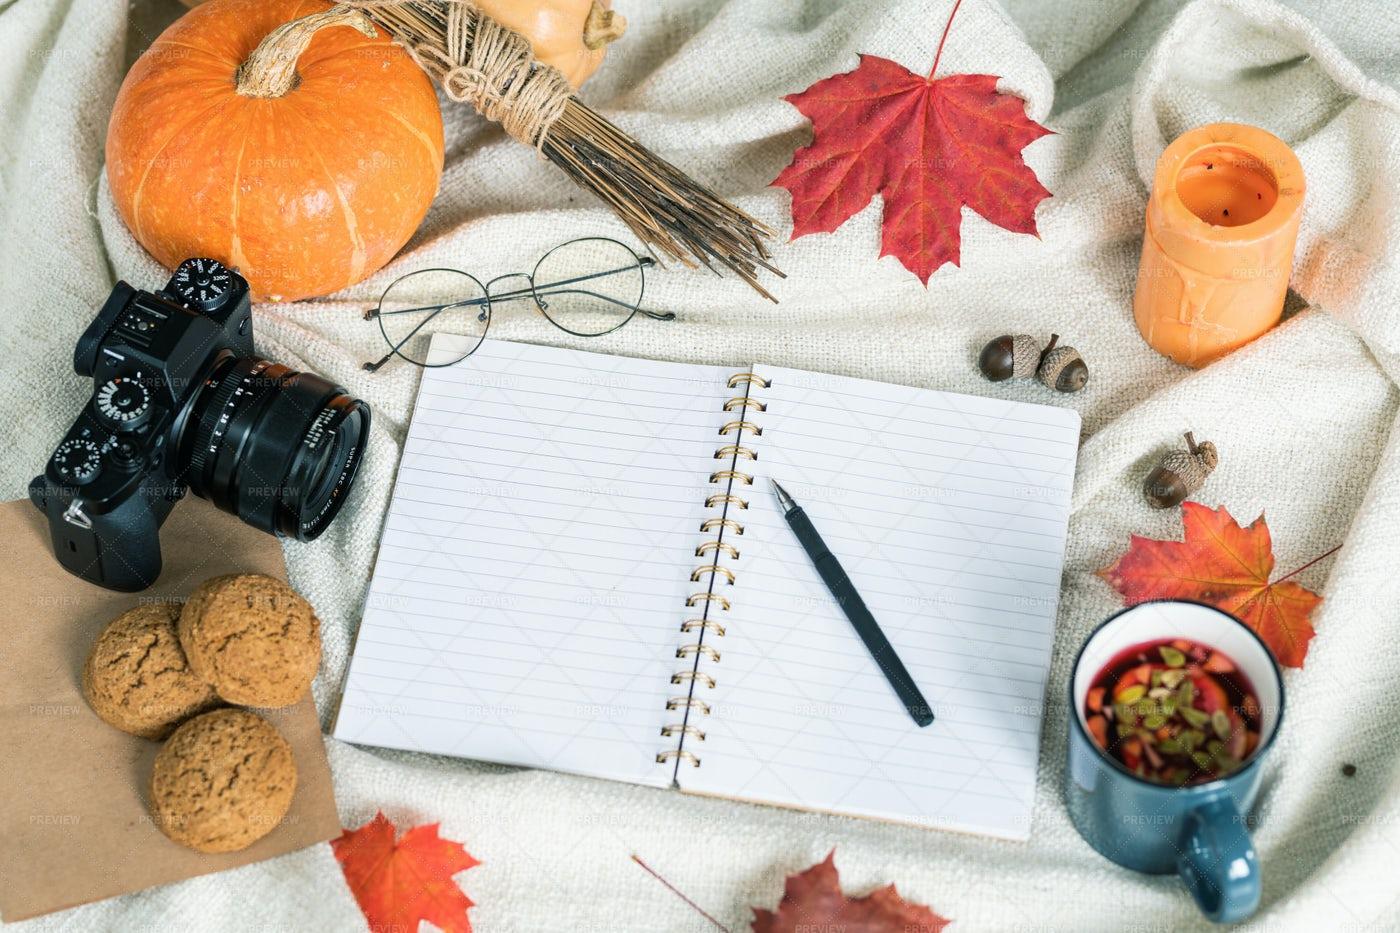 Composition Of Autumn Harvest, Food...: Stock Photos